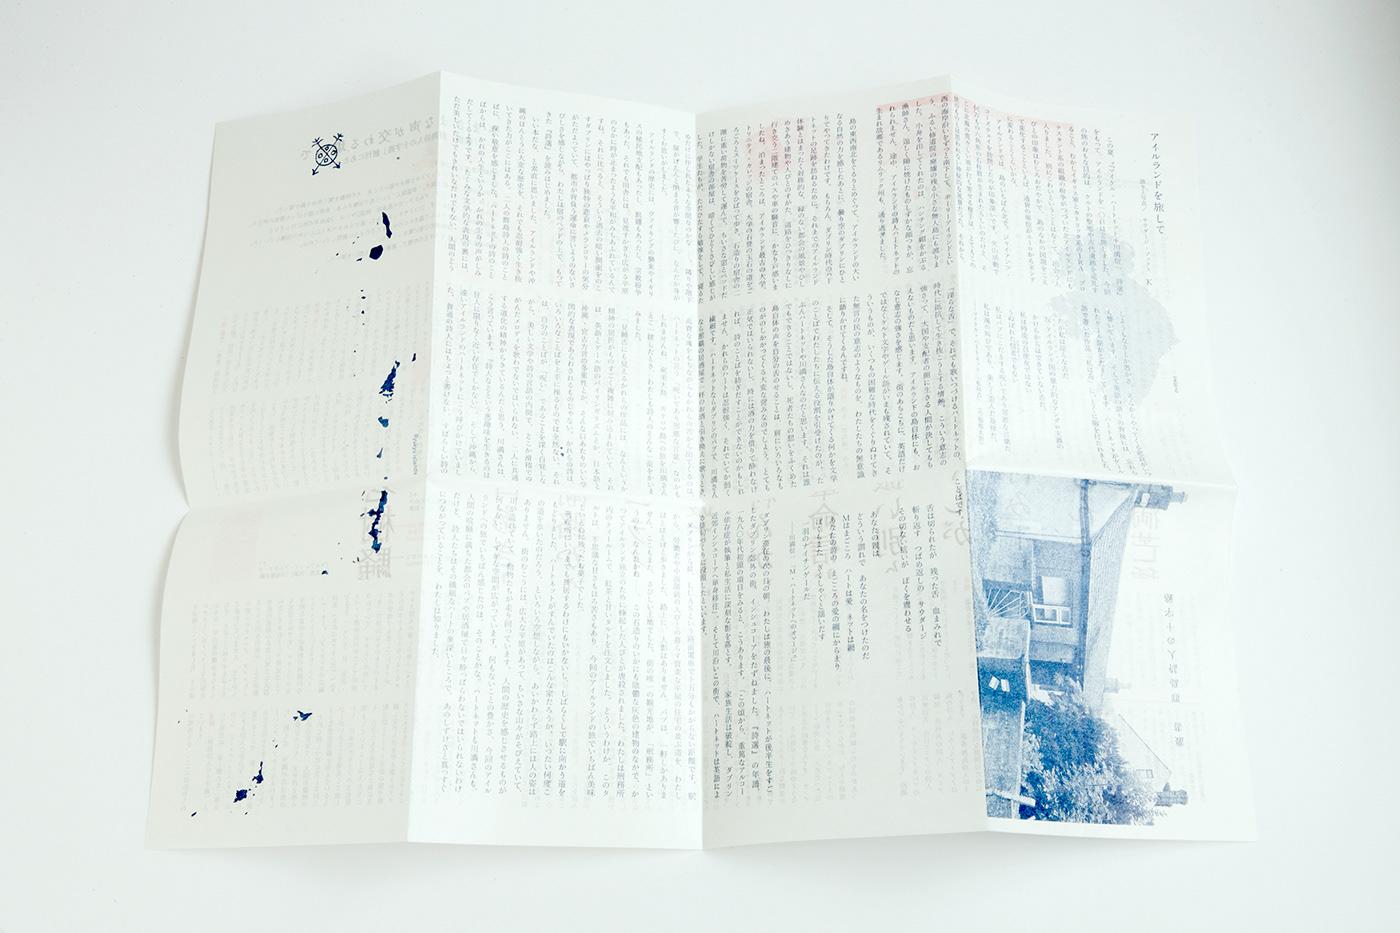 Image may contain: book and handwriting